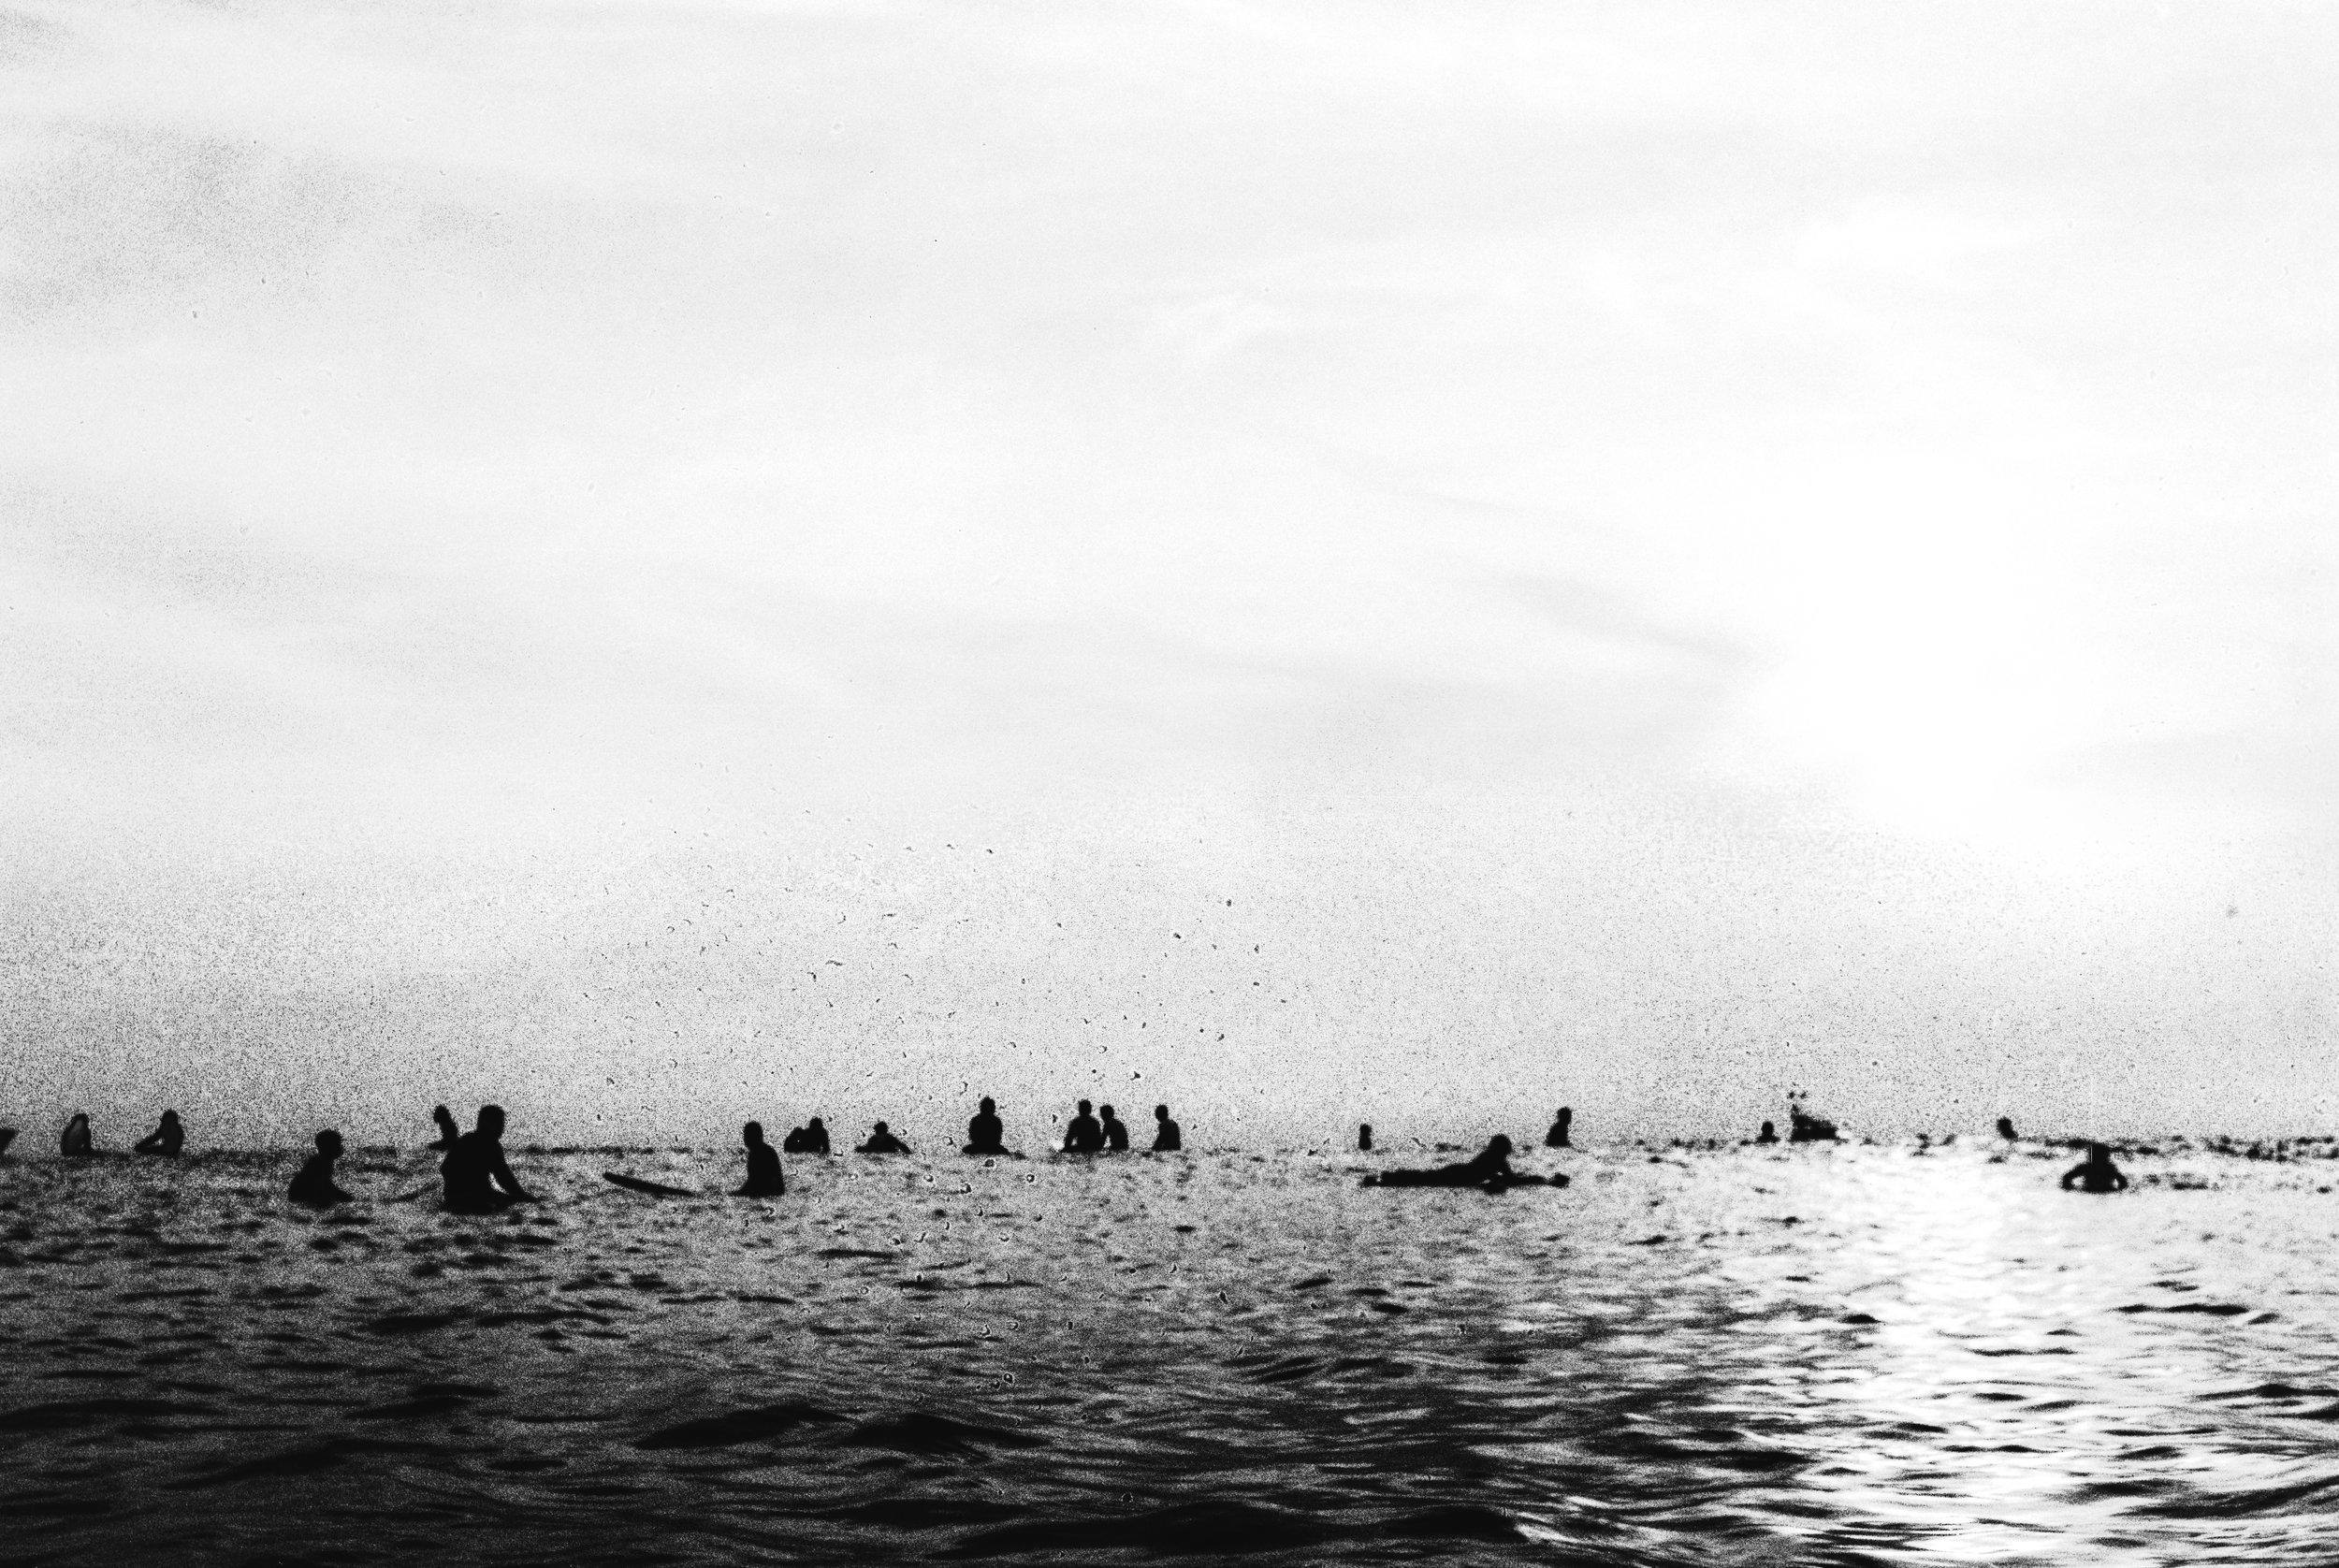 salt water_octavio_coutino 4